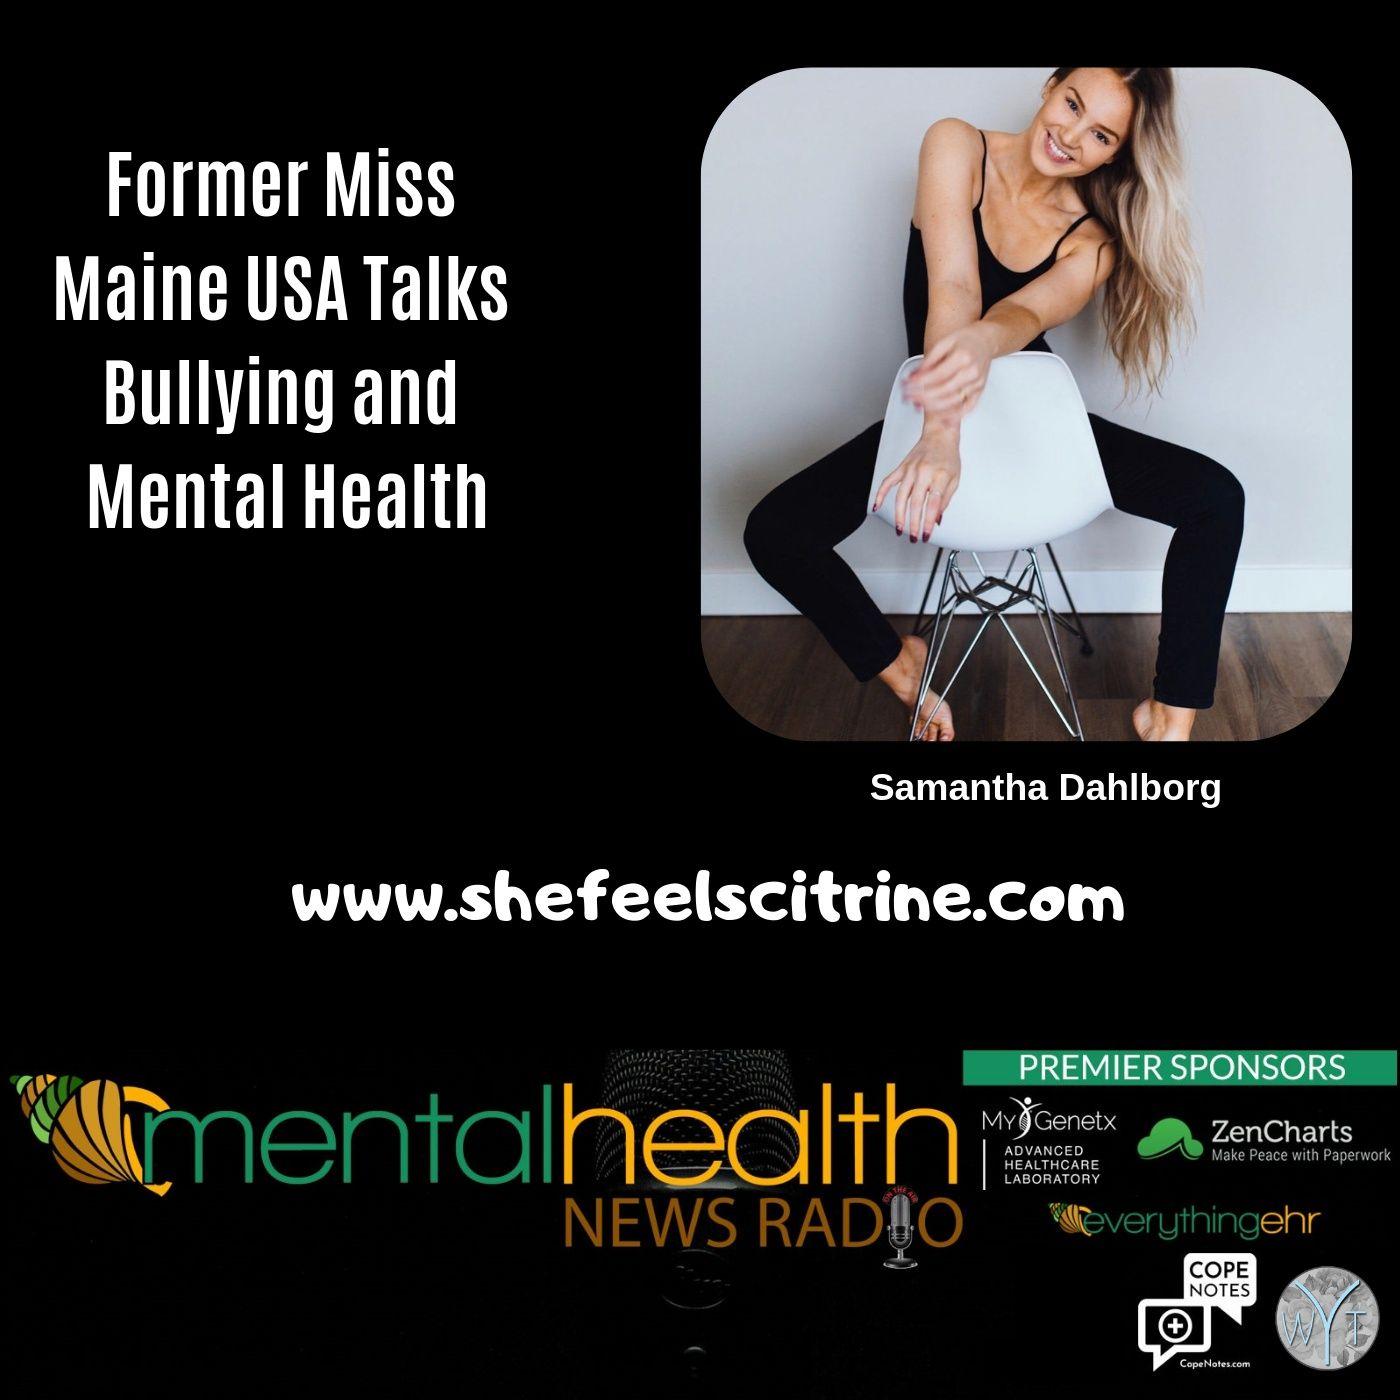 Mental Health News Radio - Former Miss Maine USA Talks Bullying and Mental Health